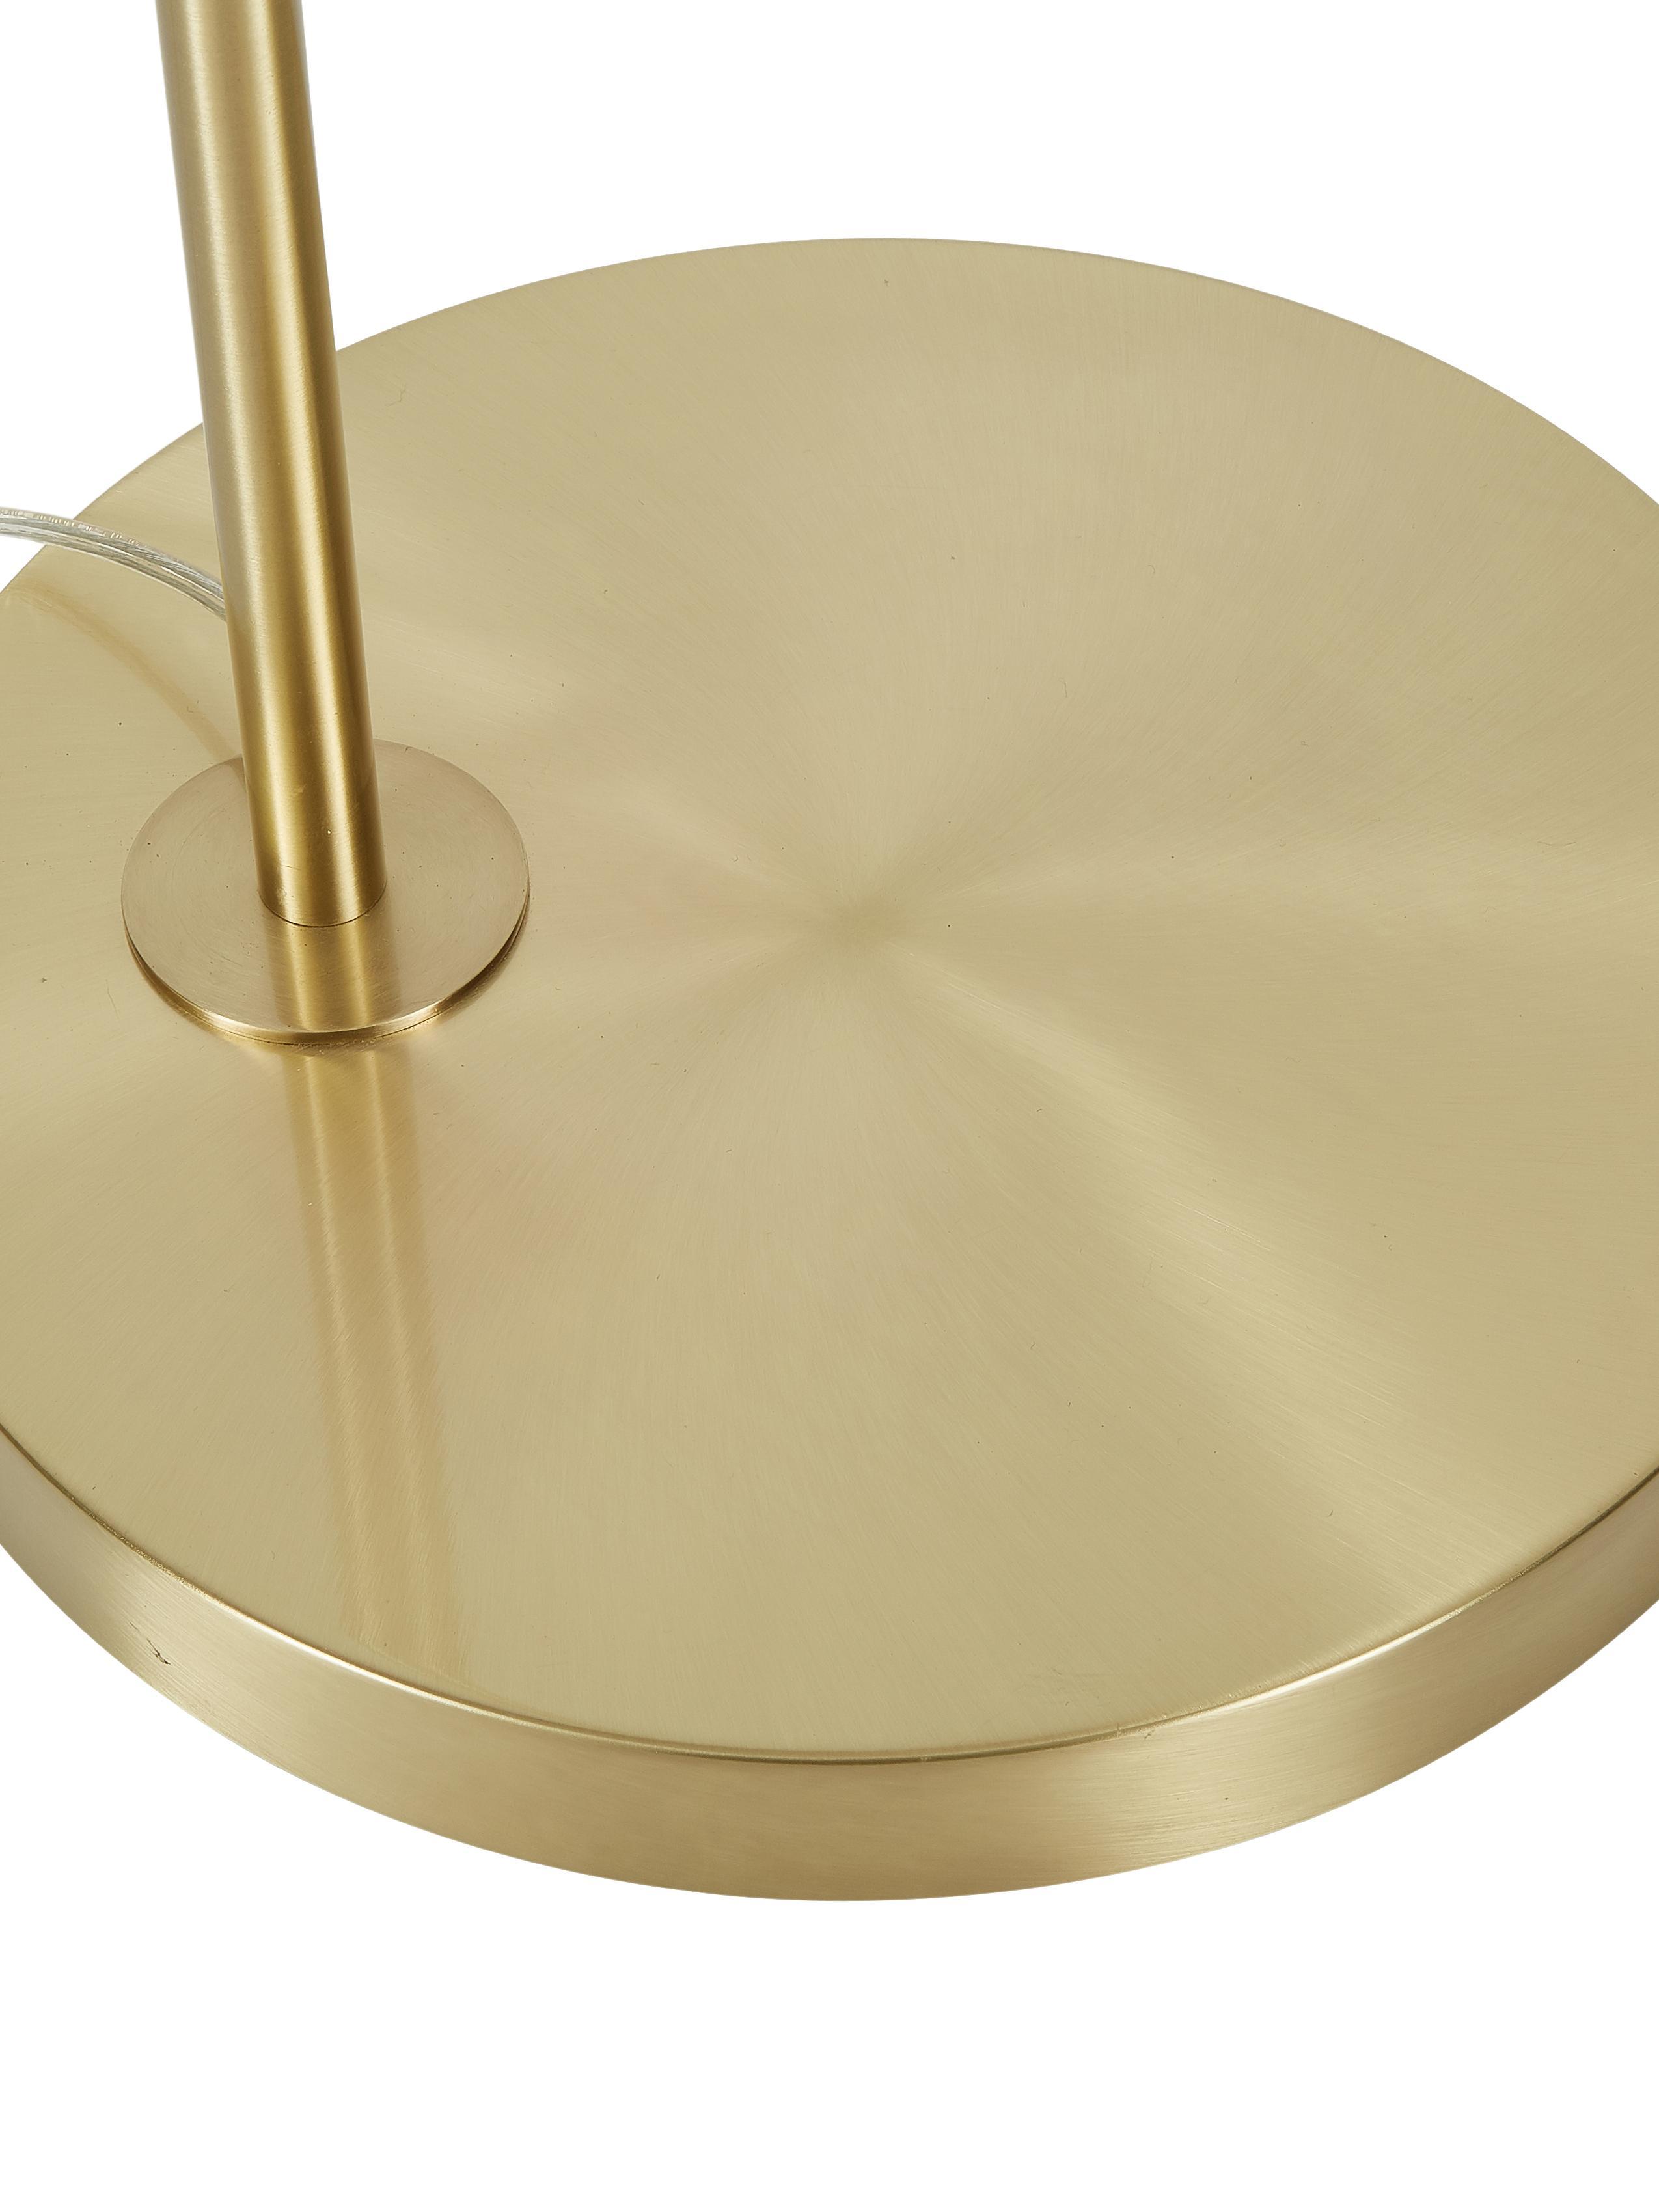 Booglamp Niels, Lampvoet: geborsteld metaal, Lampenkap: katoenmix, Lampenkap: wit. Lampvoet: messingkleurig. Snoer: transparant, 157 x 218 cm